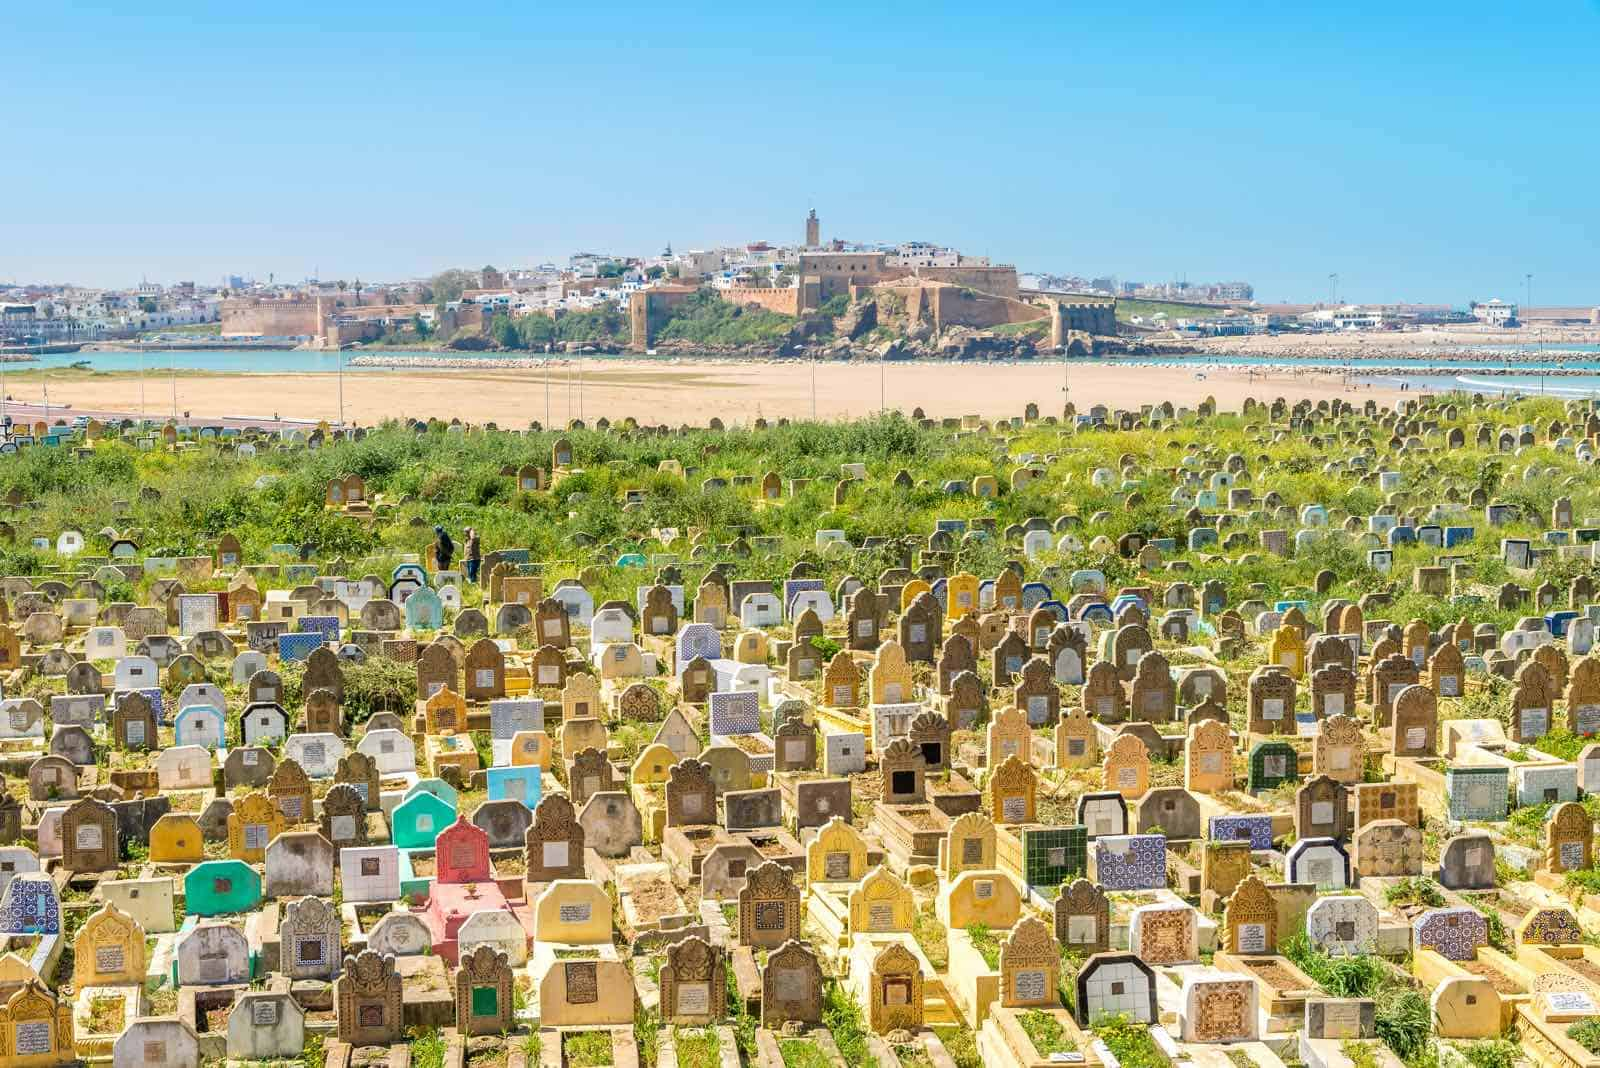 muslimsk gravplads udenfor landsbyen Sale i Marokko